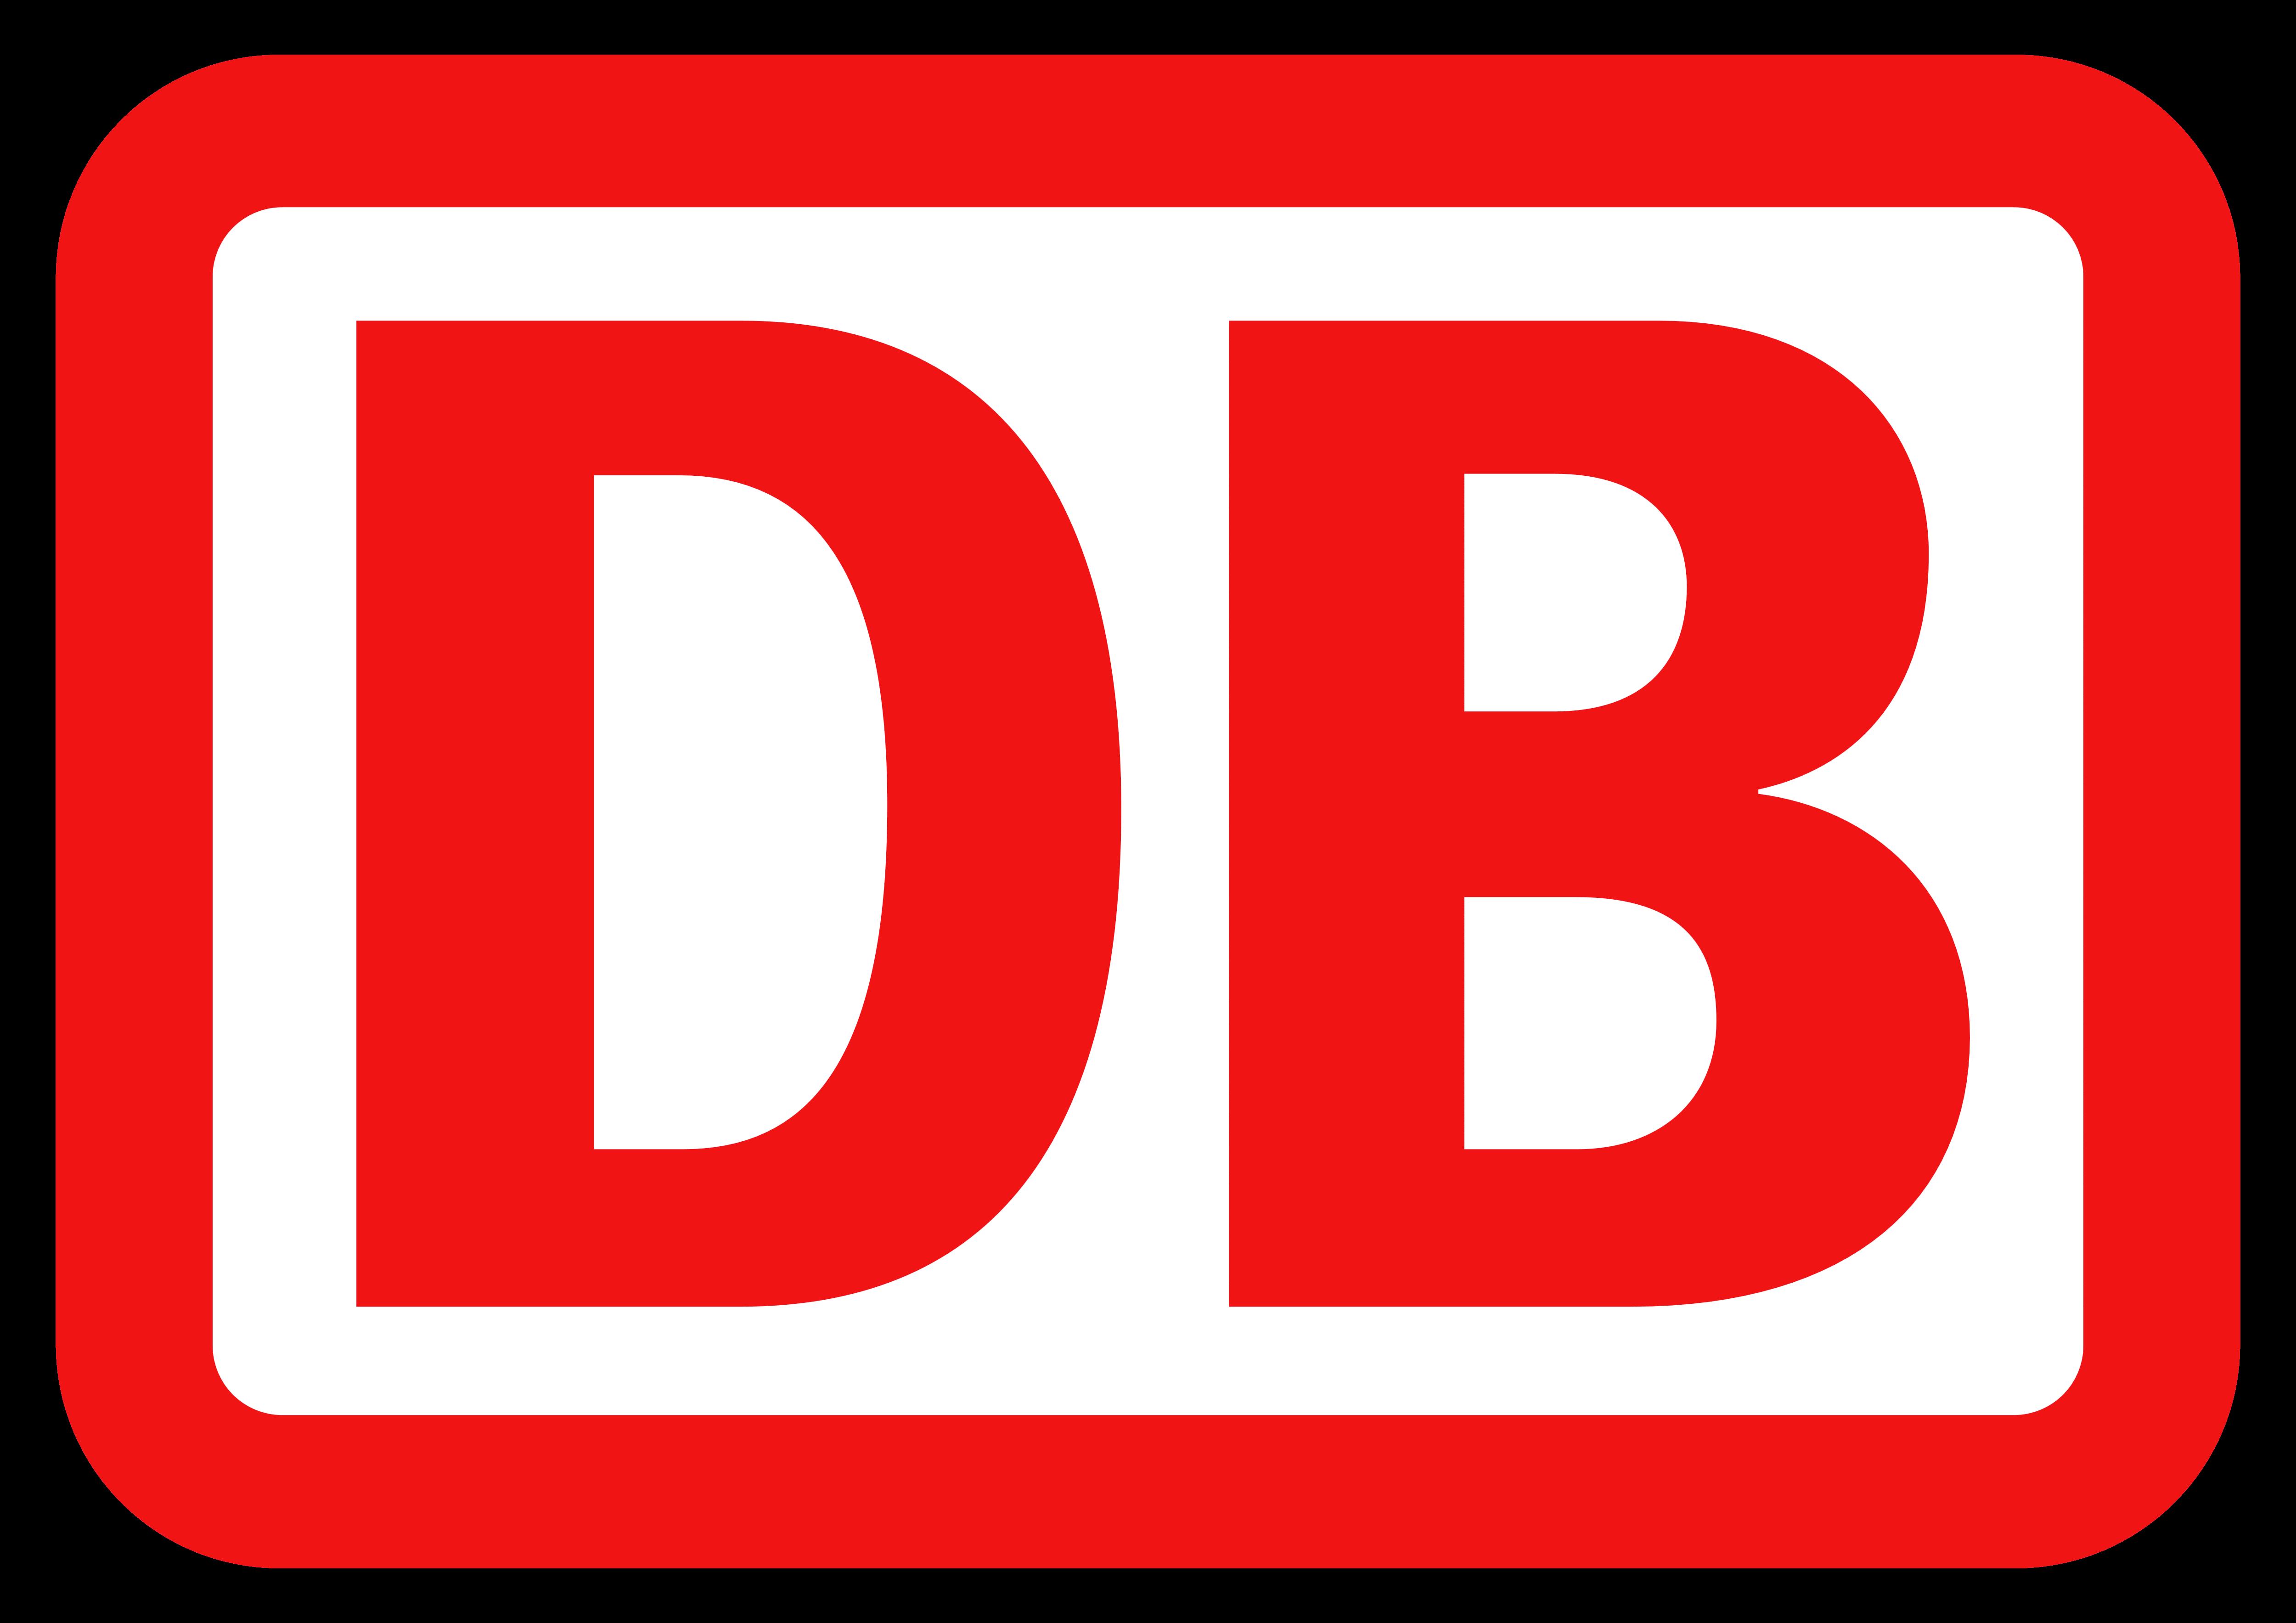 db deutsche bahn logos download. Black Bedroom Furniture Sets. Home Design Ideas